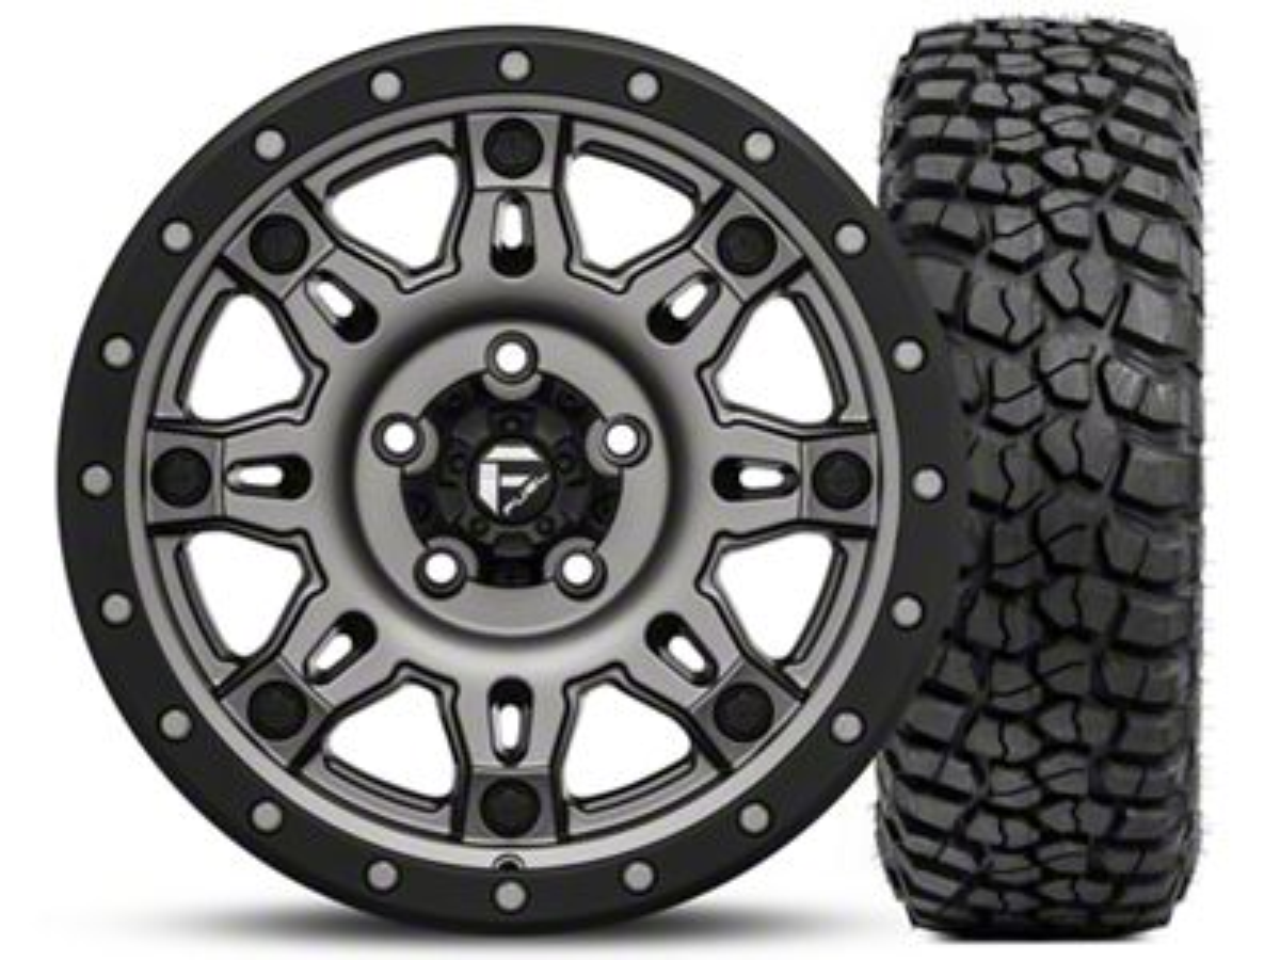 Fuel Wheels Hostage III Gunmetal and Black Wheel 17x9 and BF Goodrich Mud Terrain T/A KM2 265/70R17 Kit (07-18 Jeep Wrangler JK; 2018 Jeep Wrangler JL)